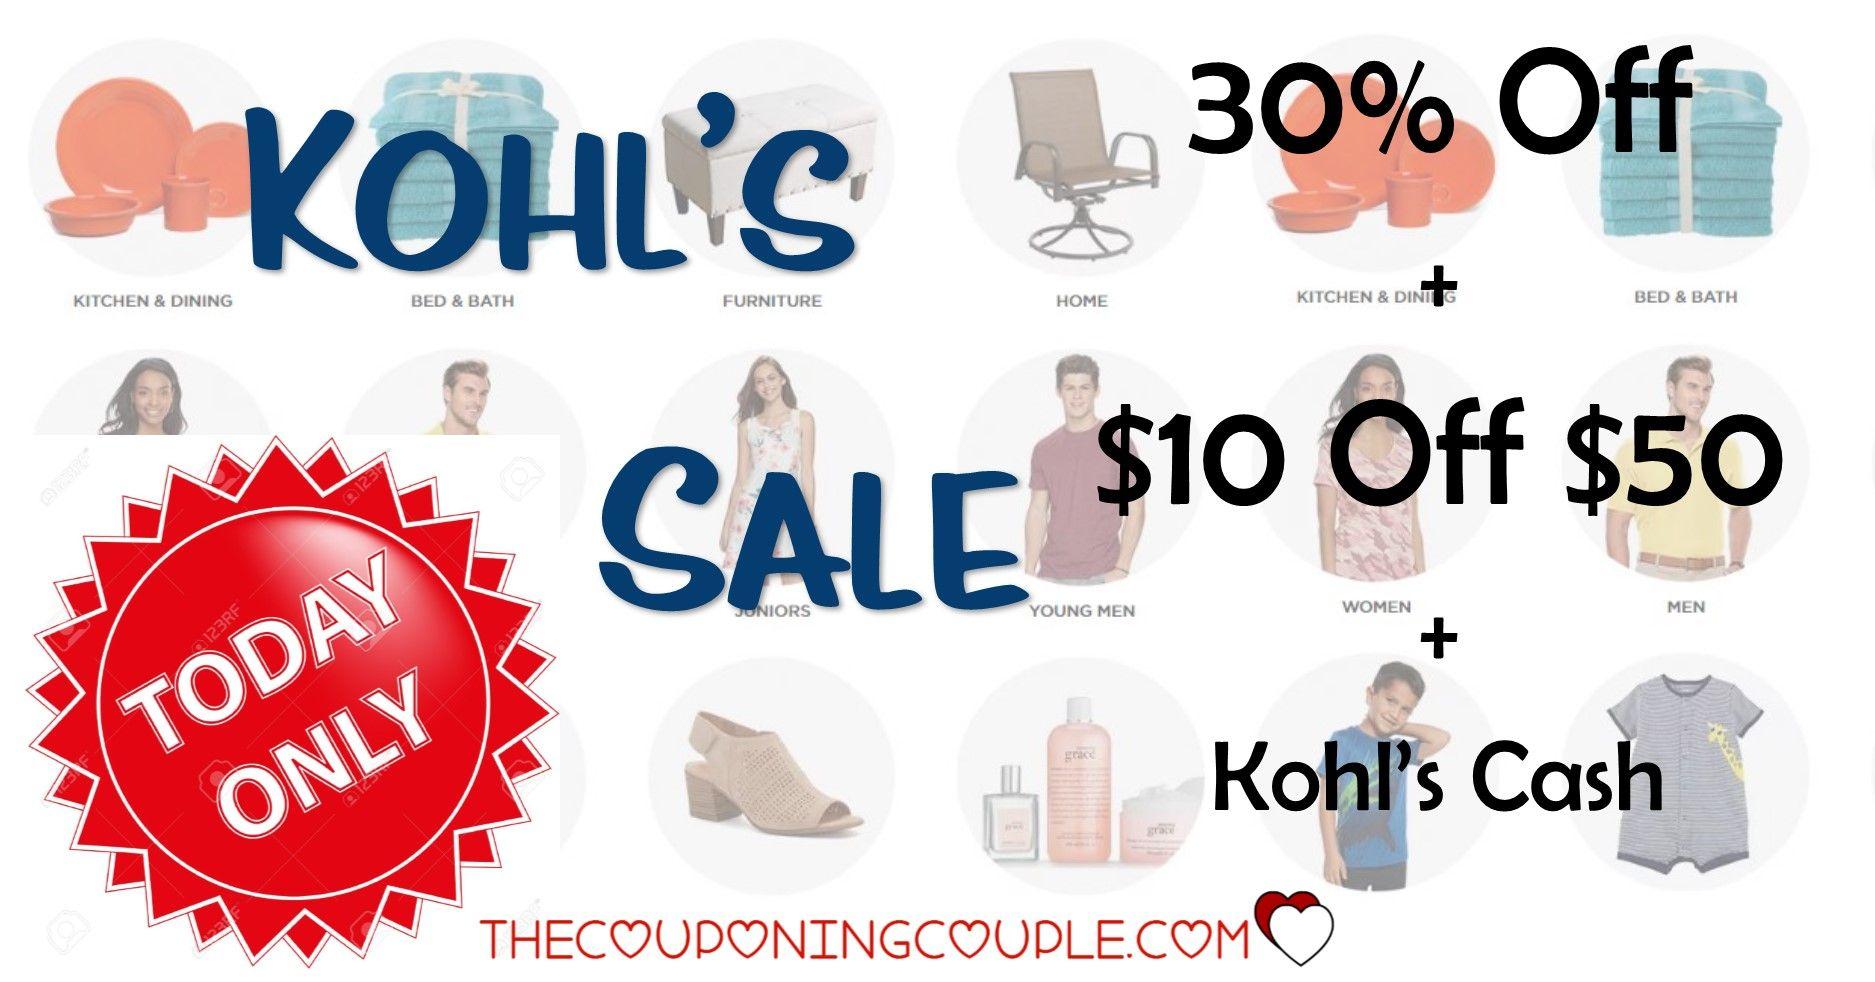 Kohls Sale 30 Off + Free Shipping + 10/50 Kohls Cash